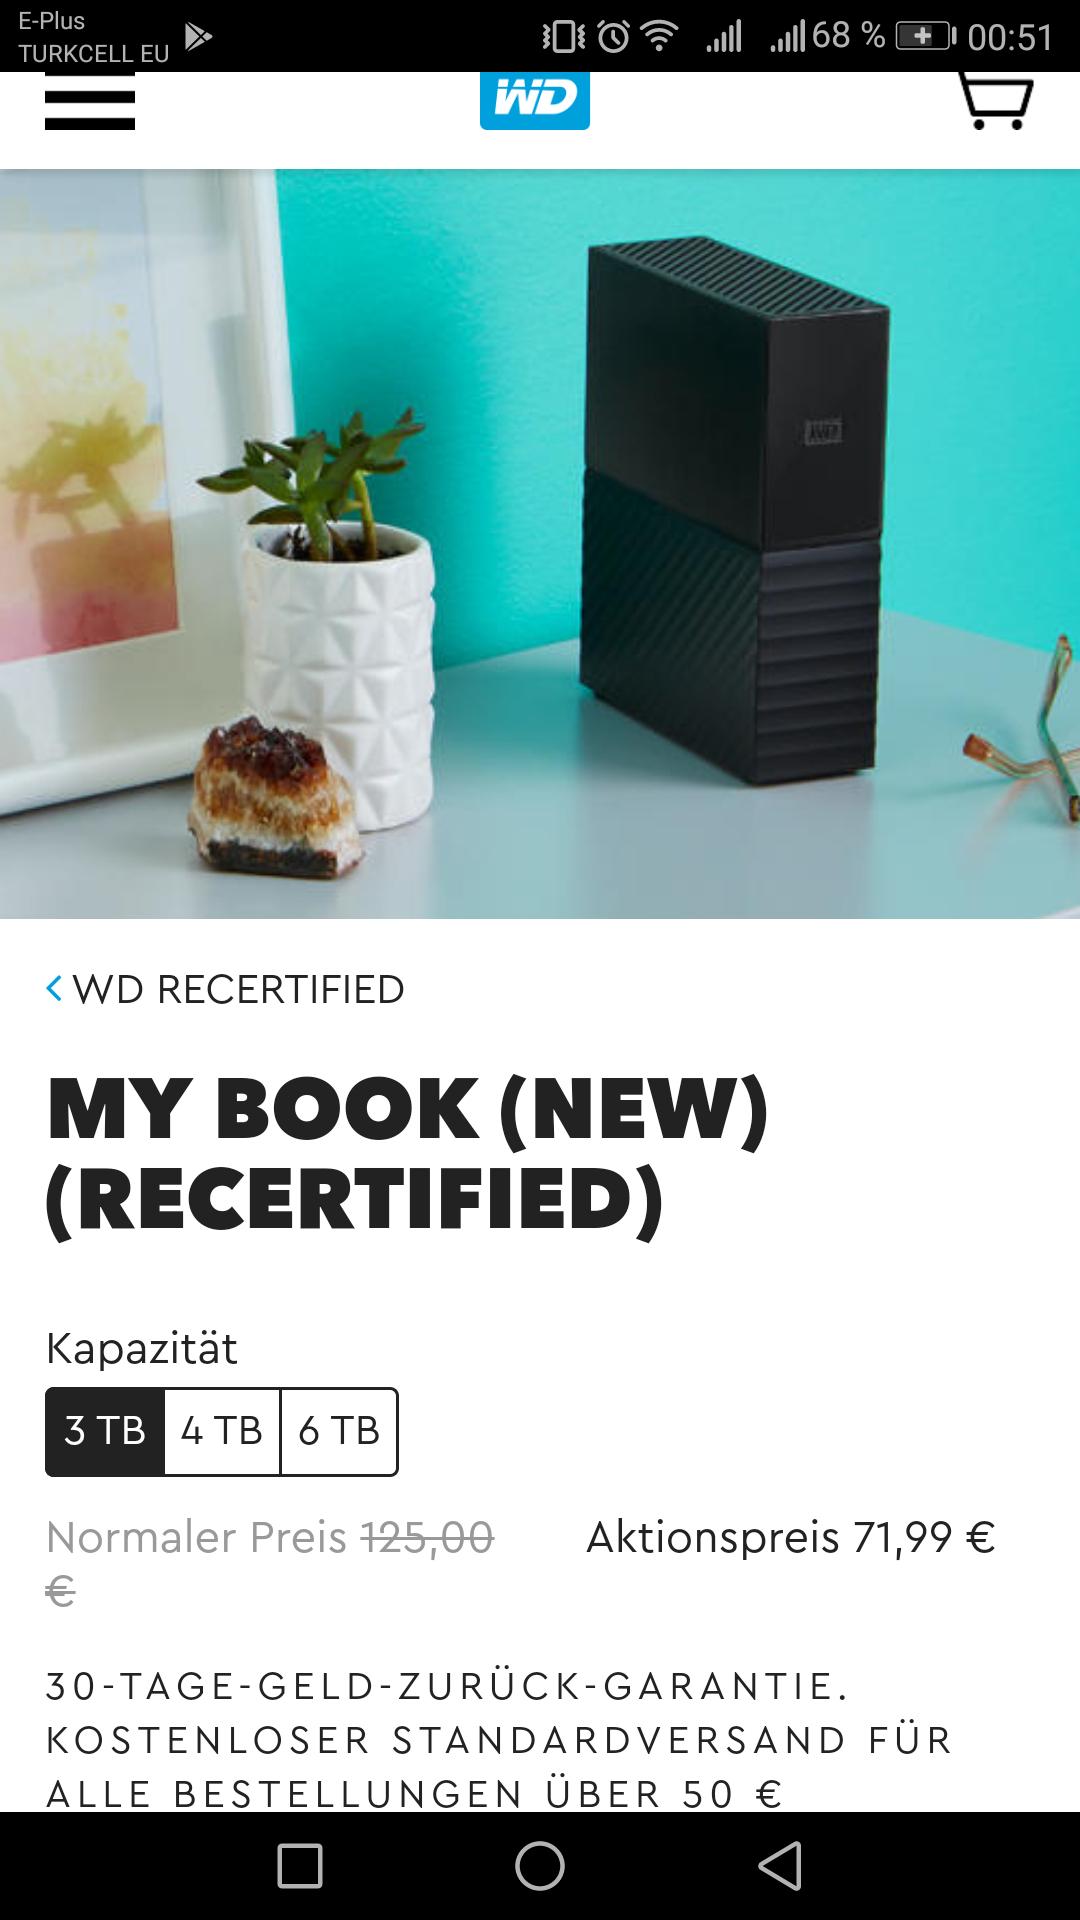 WD MyBook New 3TB Externe Desktop Festplatte (RECERTIFIED)